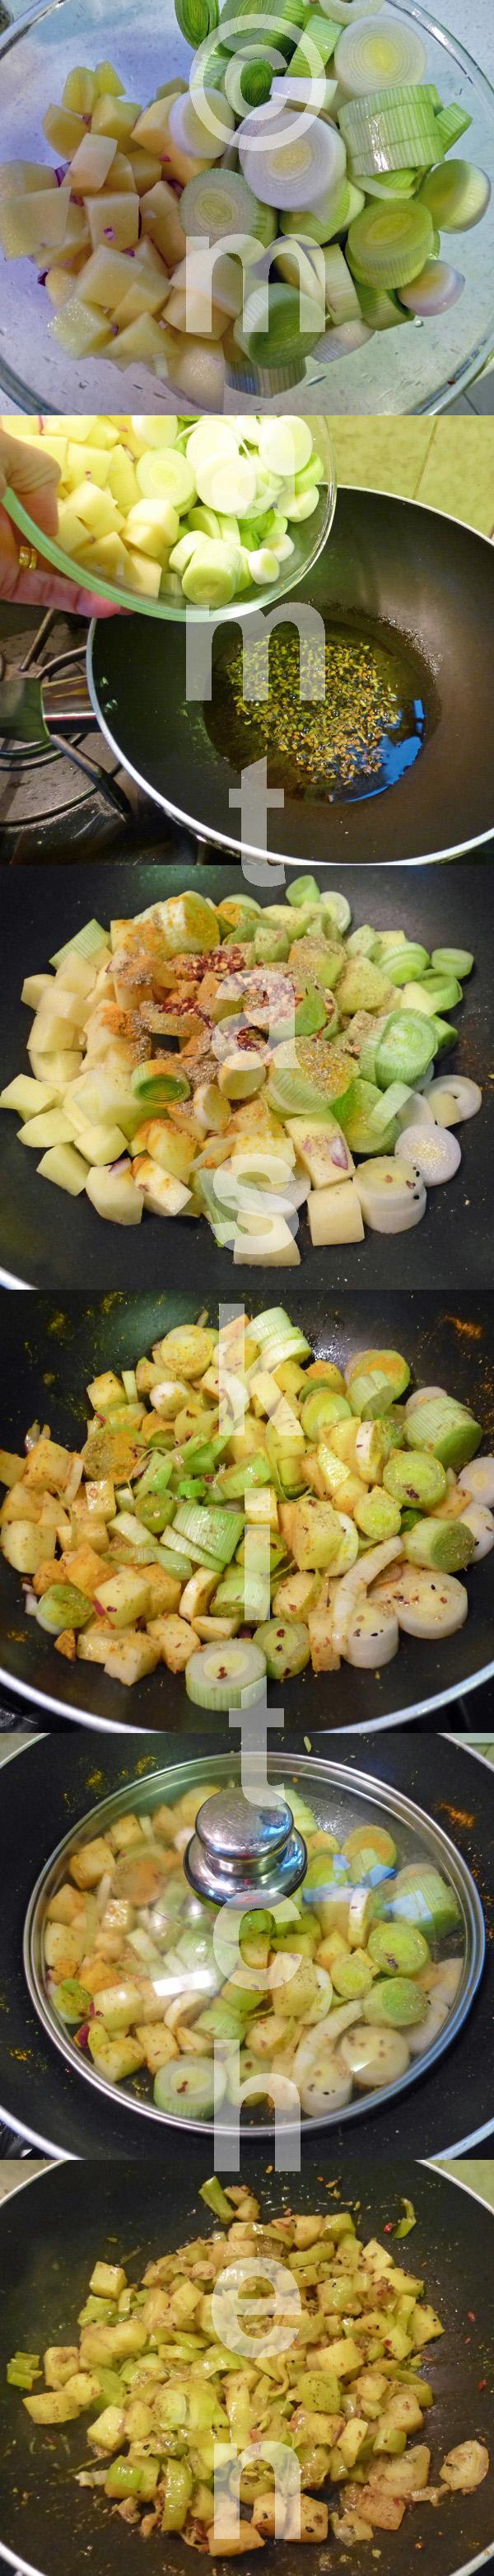 Leek and Potato Bhaji/Sabji